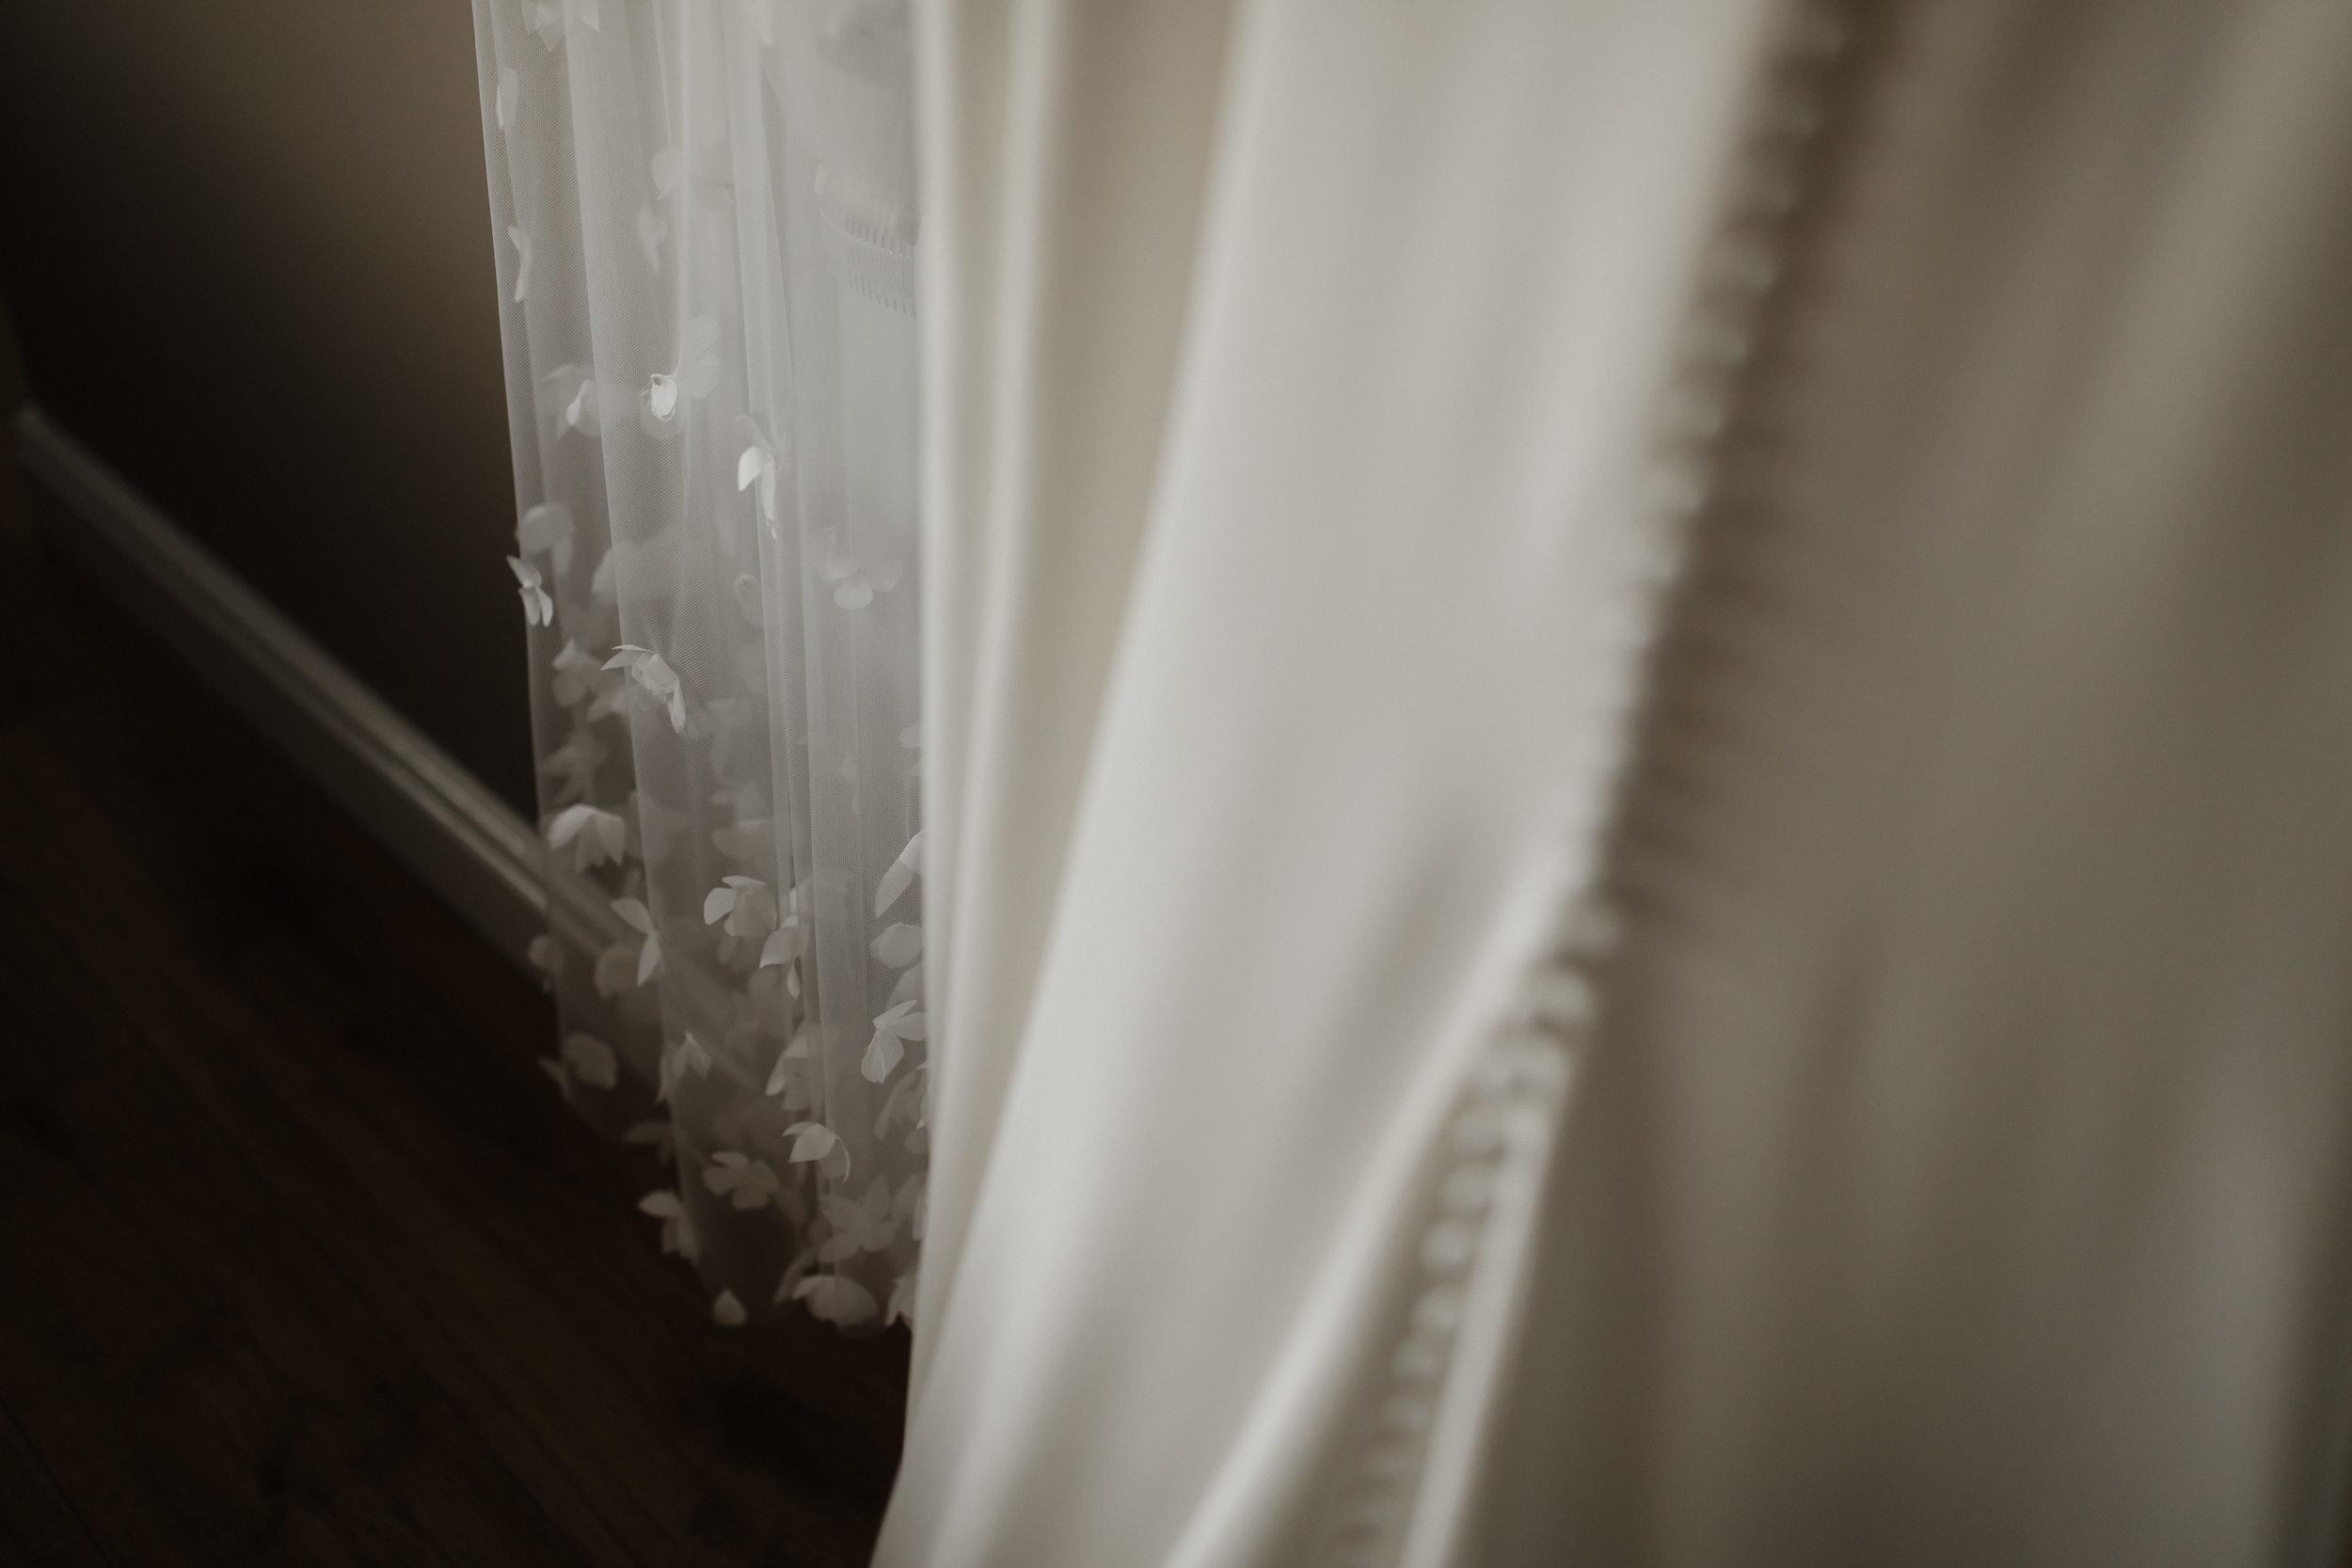 Lauren-Peak-District-Bespoke-Wedding-Gown-Petal-Veil-Train-Long-Sleeve-Susanna-Greening-Designs-Matlock-Derbyshire-6